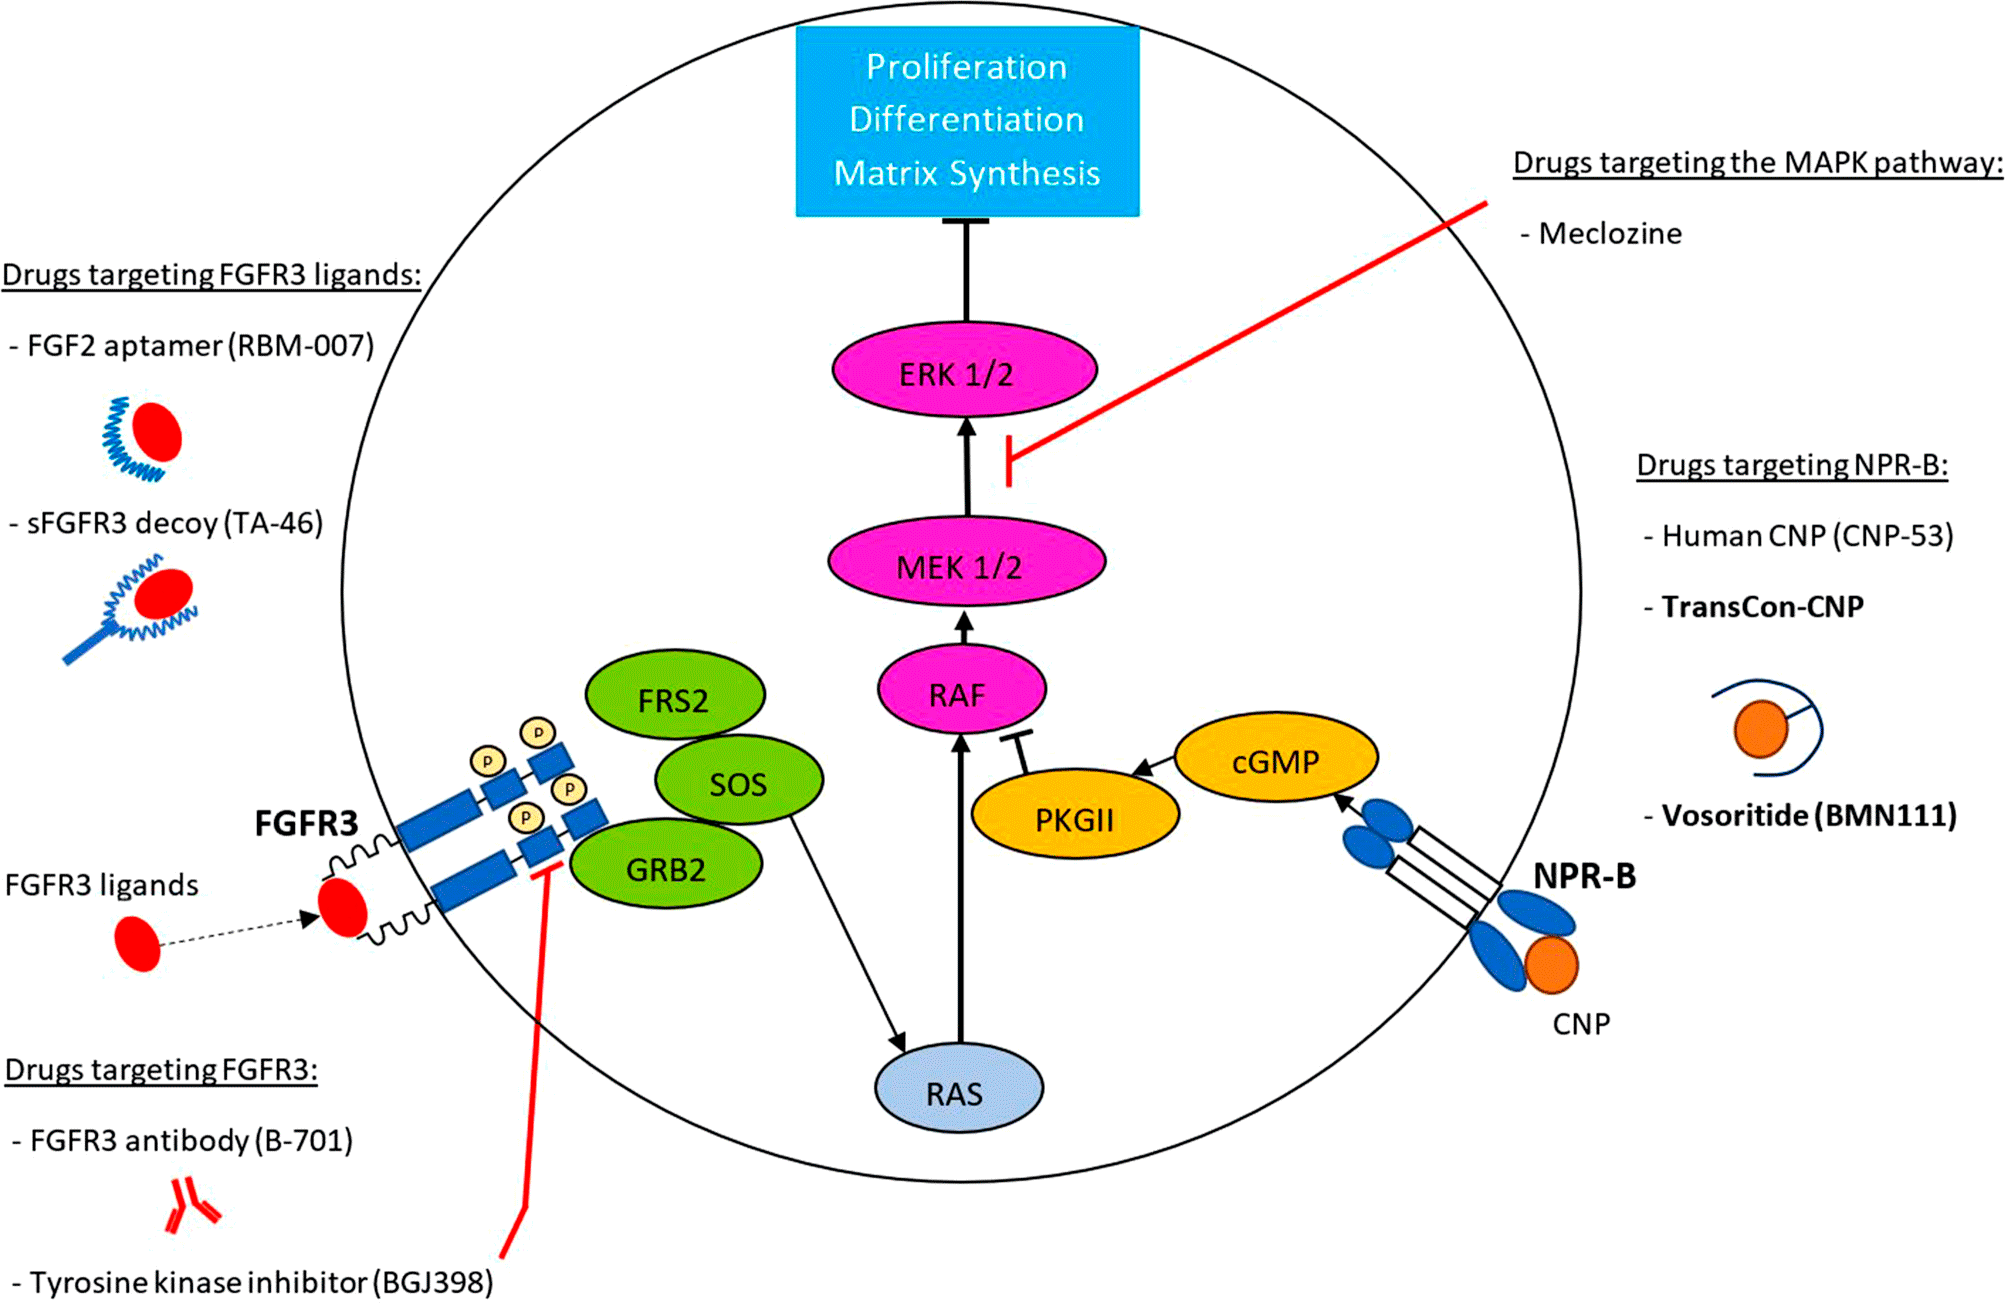 drugs in development for the treatment of achondroplasia - Восоритид: первое лекарство против карликовости